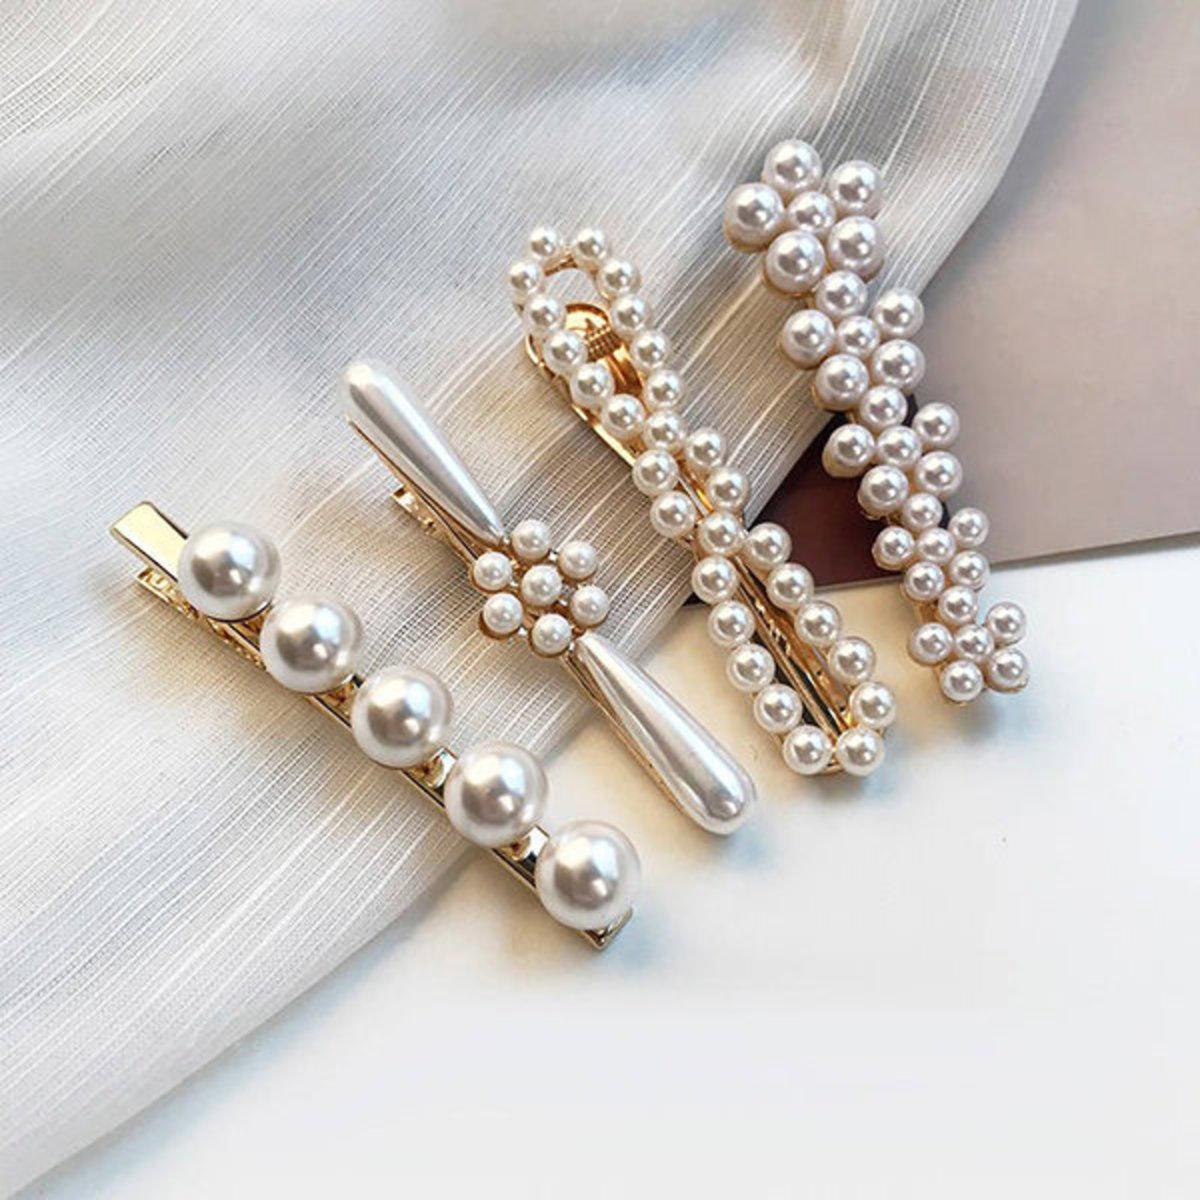 Korea JK Pearl Hairpin Set (4 piece set)